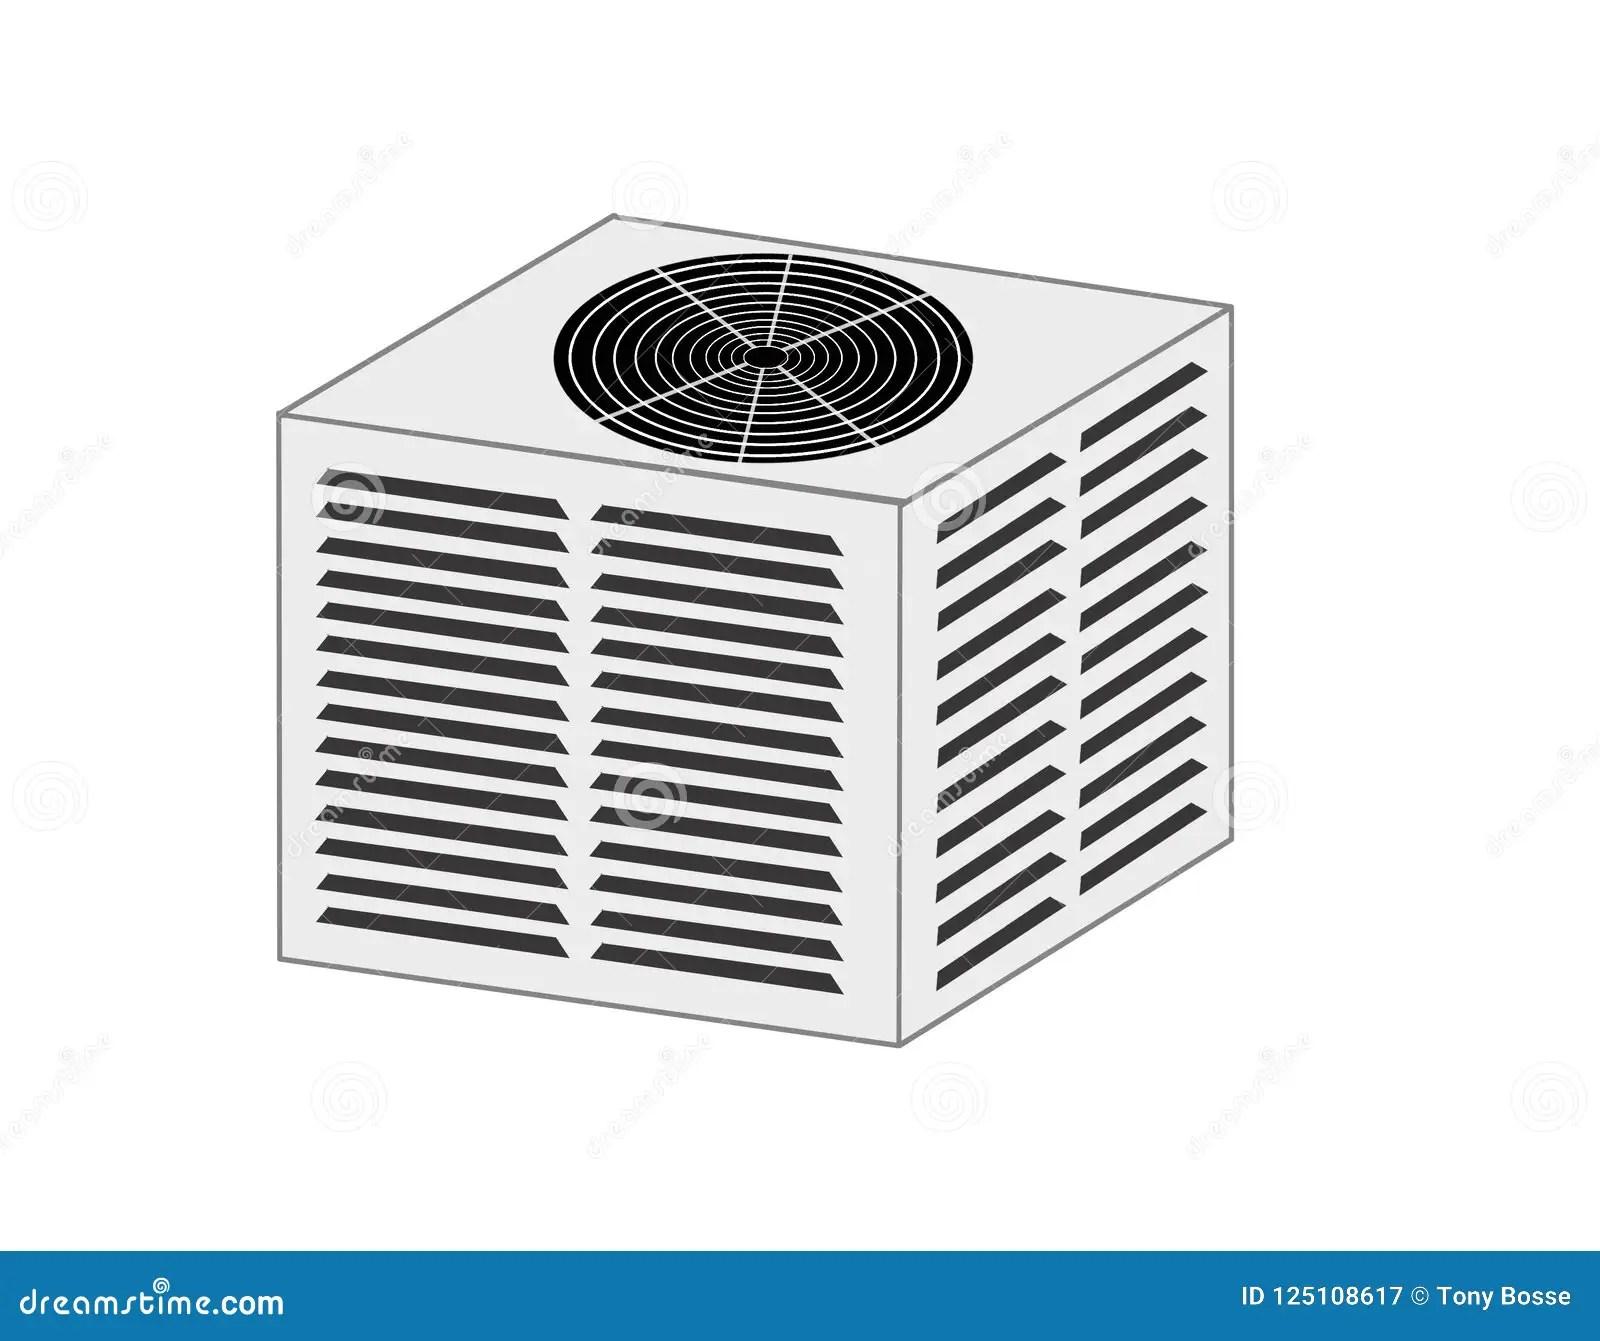 Hvac Condenser Unit Illustration Stock Illustration